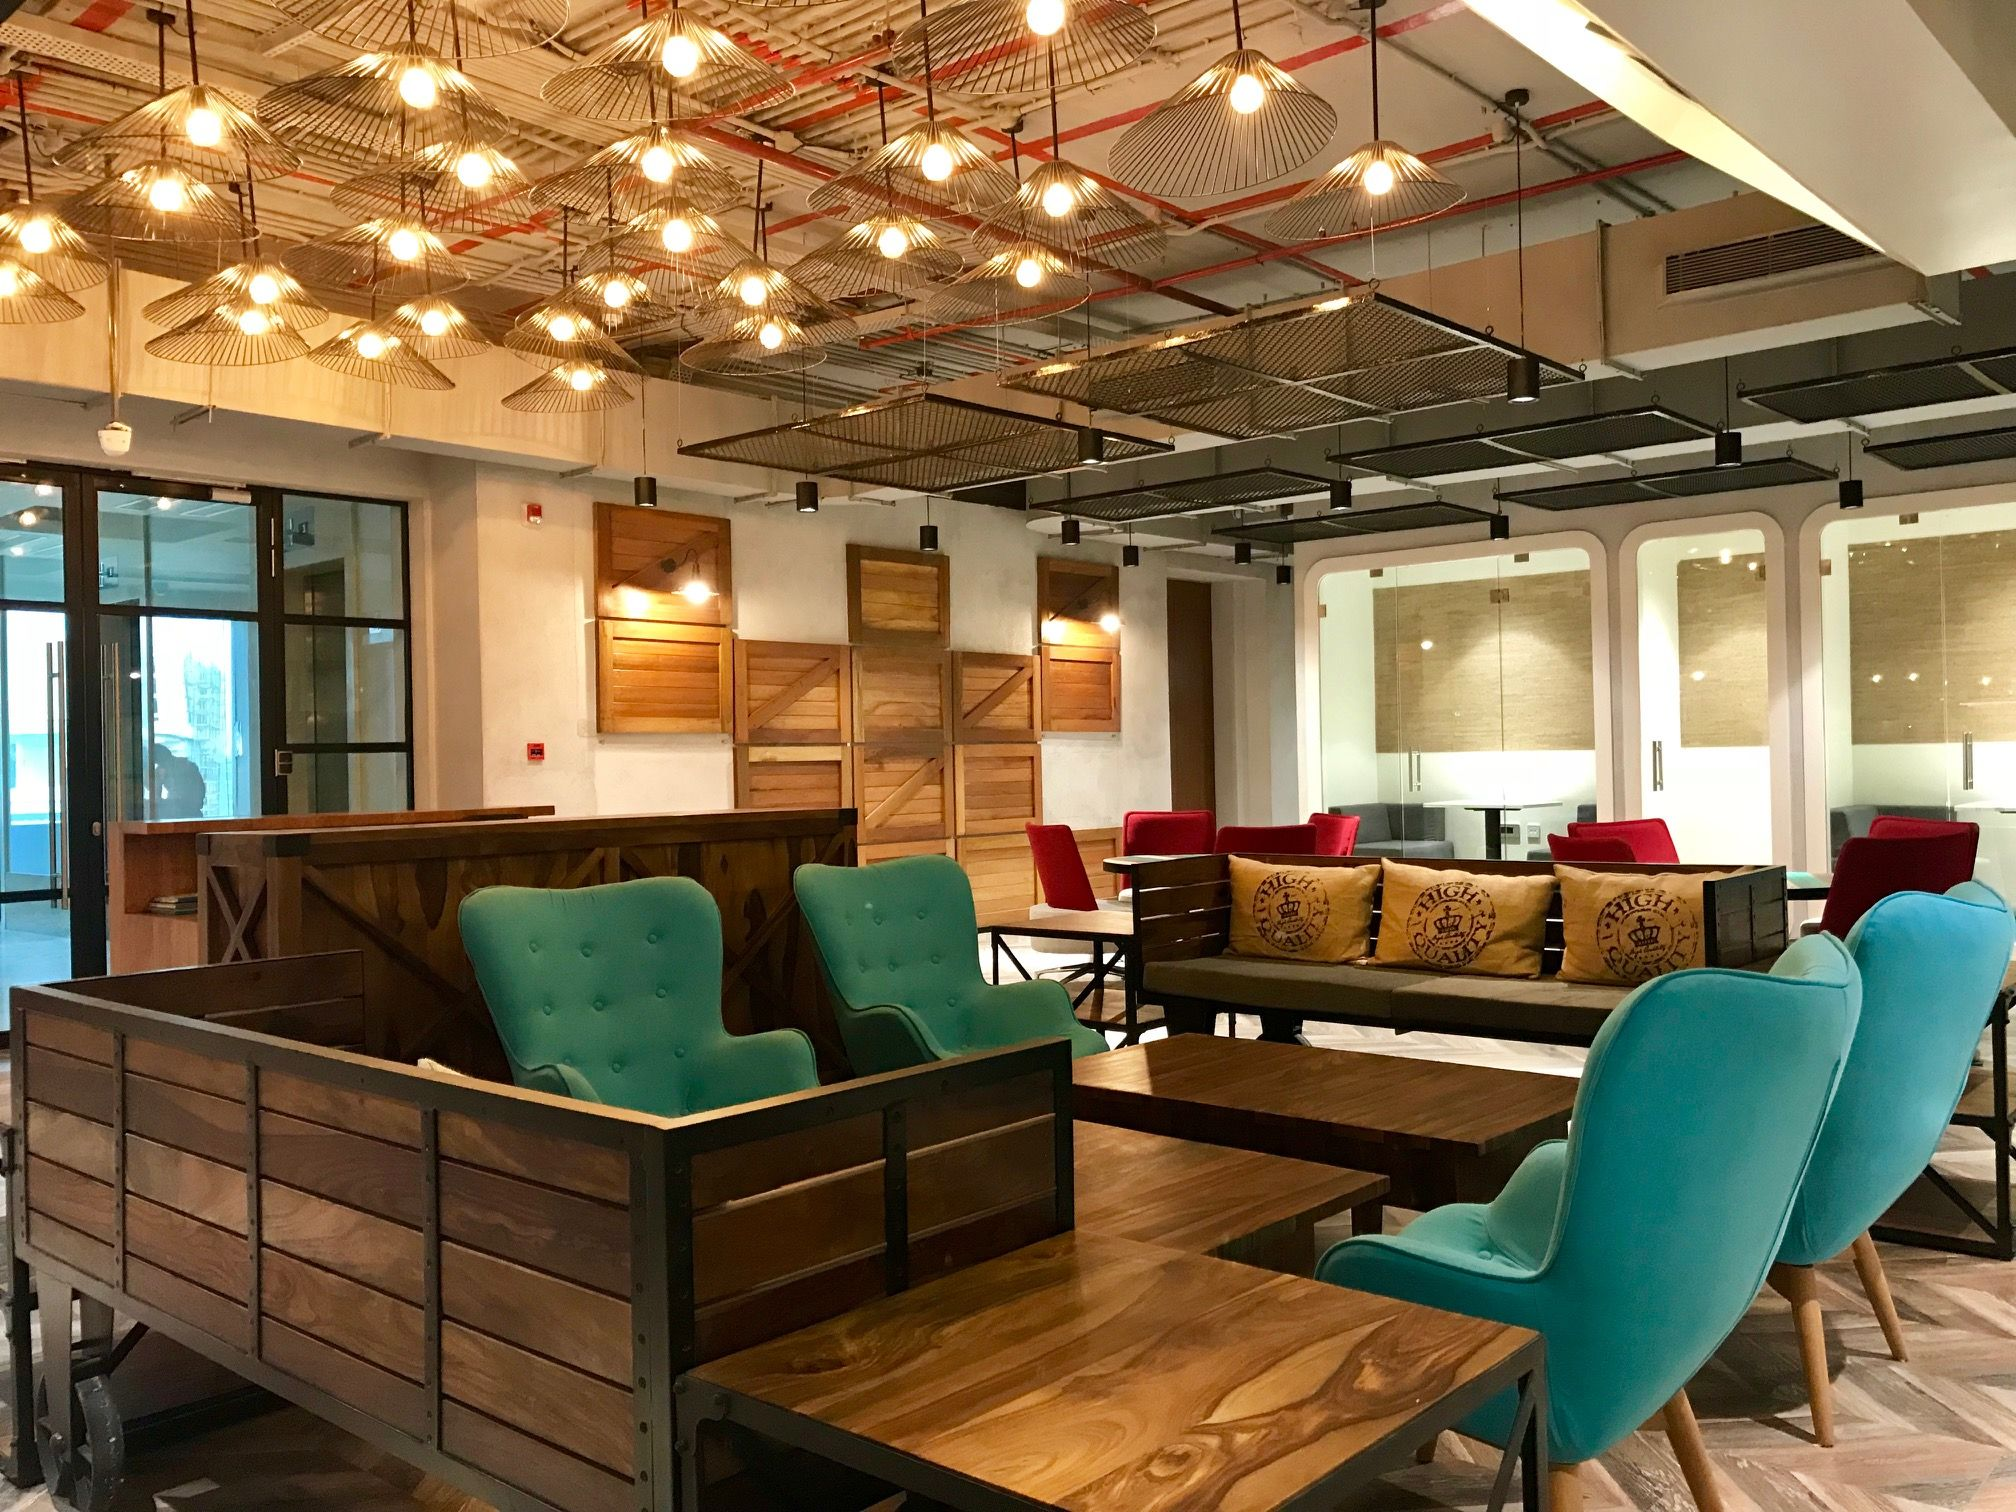 Coworking Space In Bnagaluru   Office Space In Bangaluru   Awfis